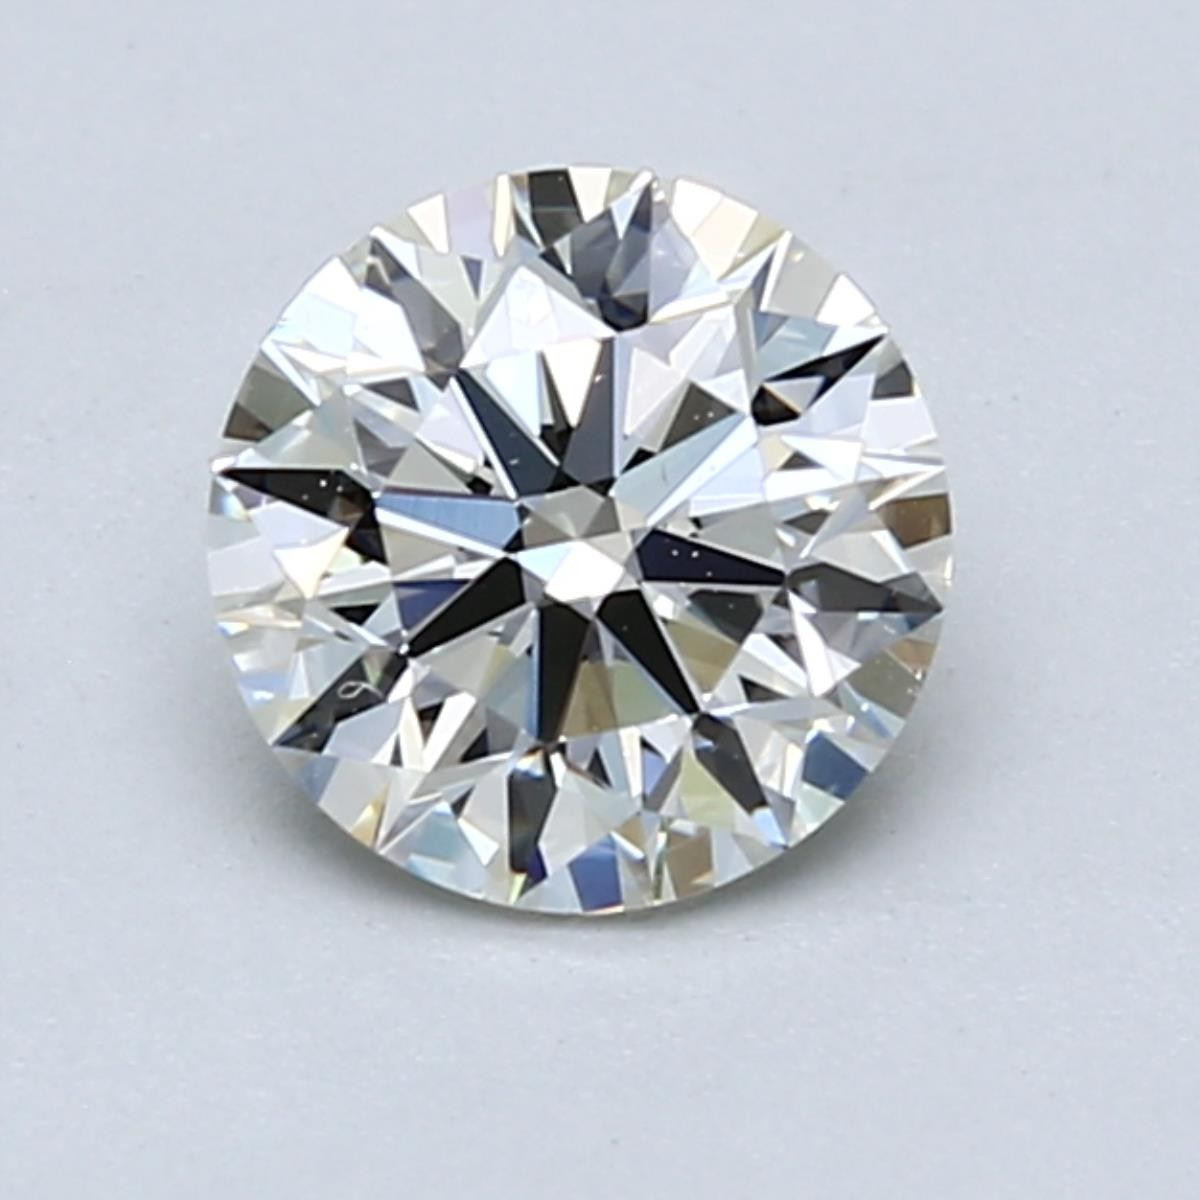 1.2 carat K VVS1 diamond facing up white due to high cut quality